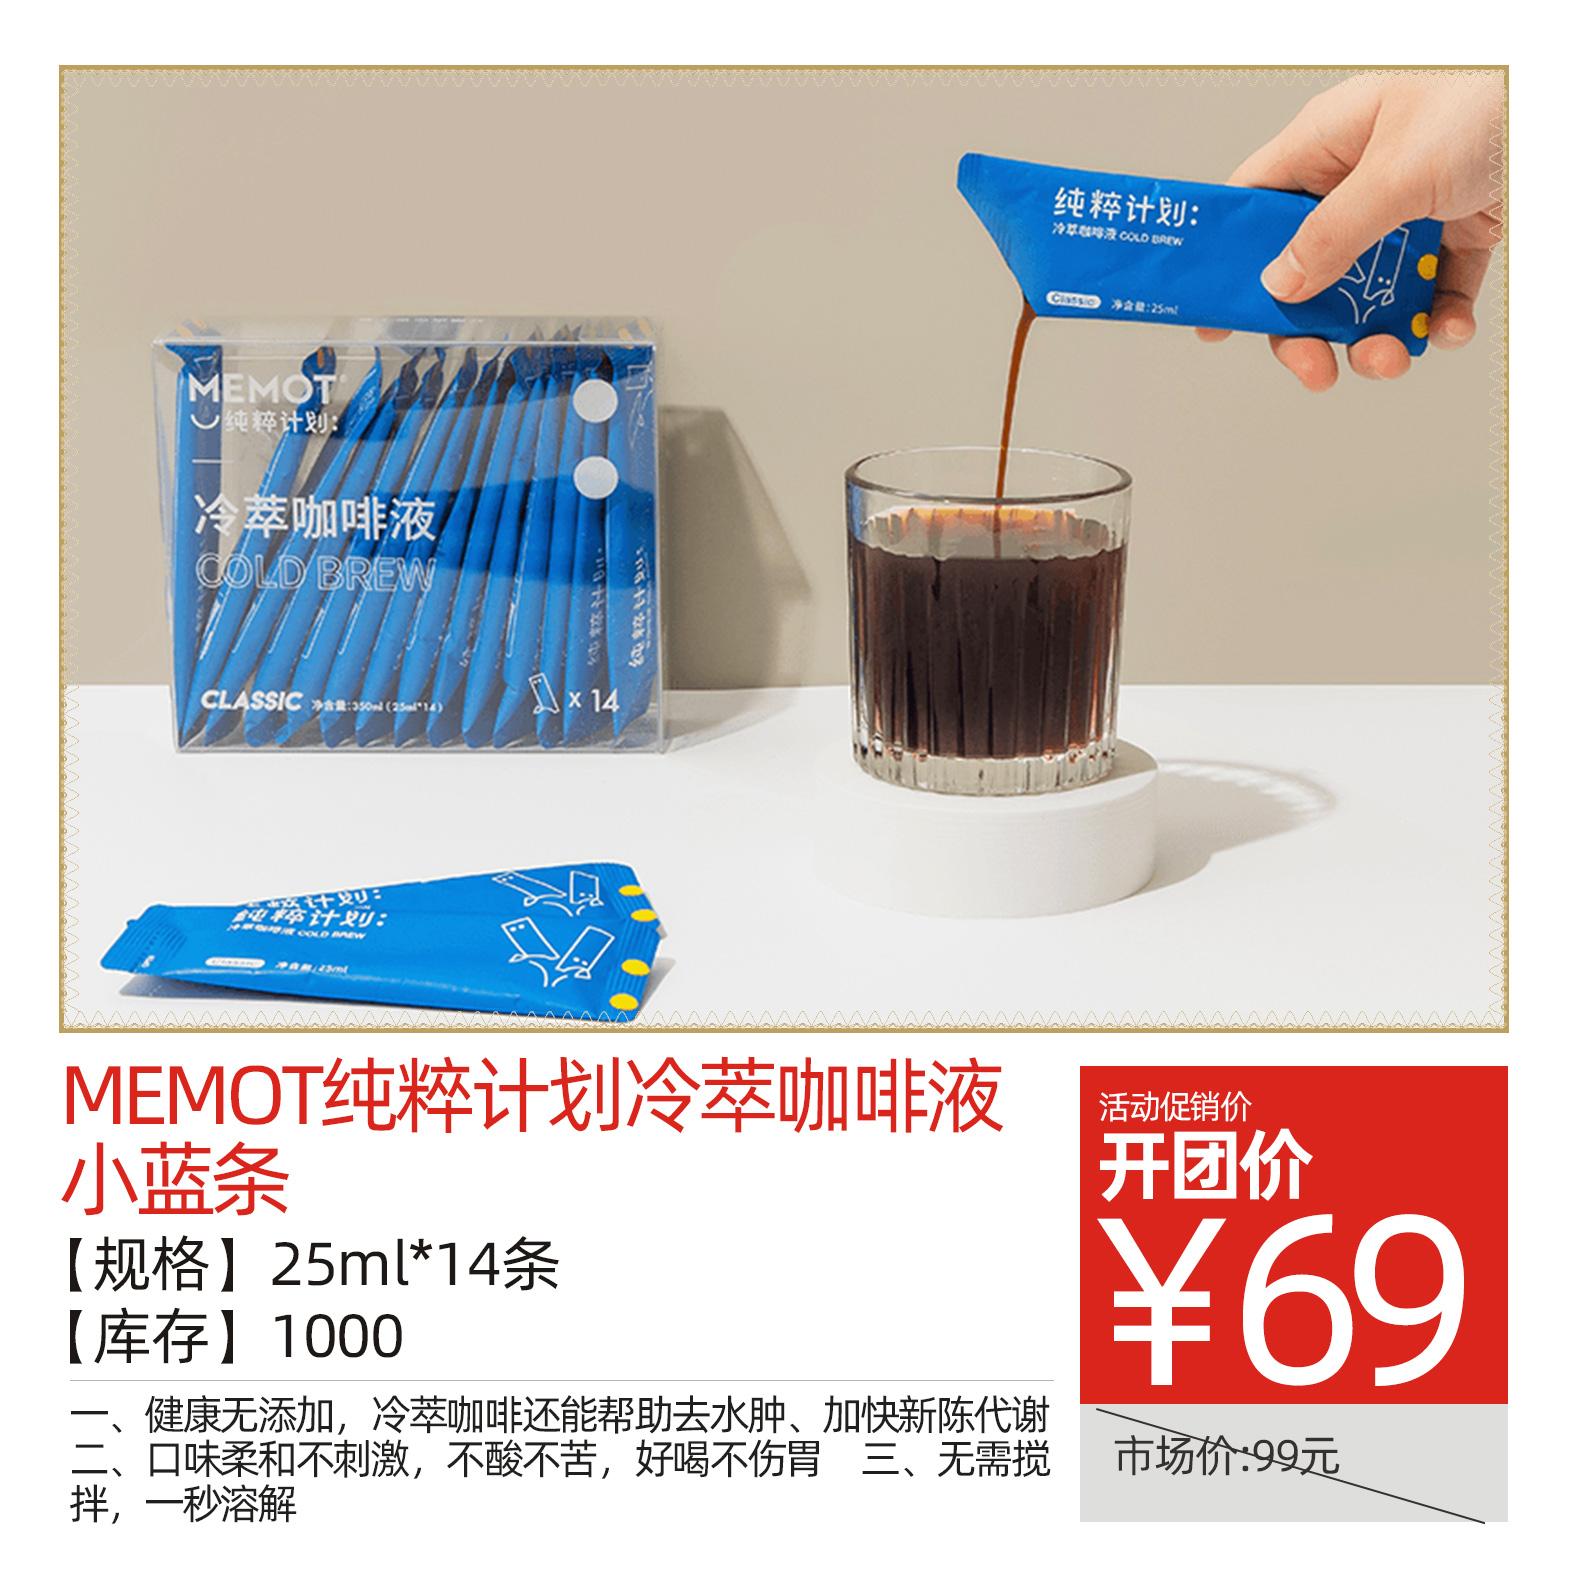 memot纯粹计划冷萃咖啡液小蓝条